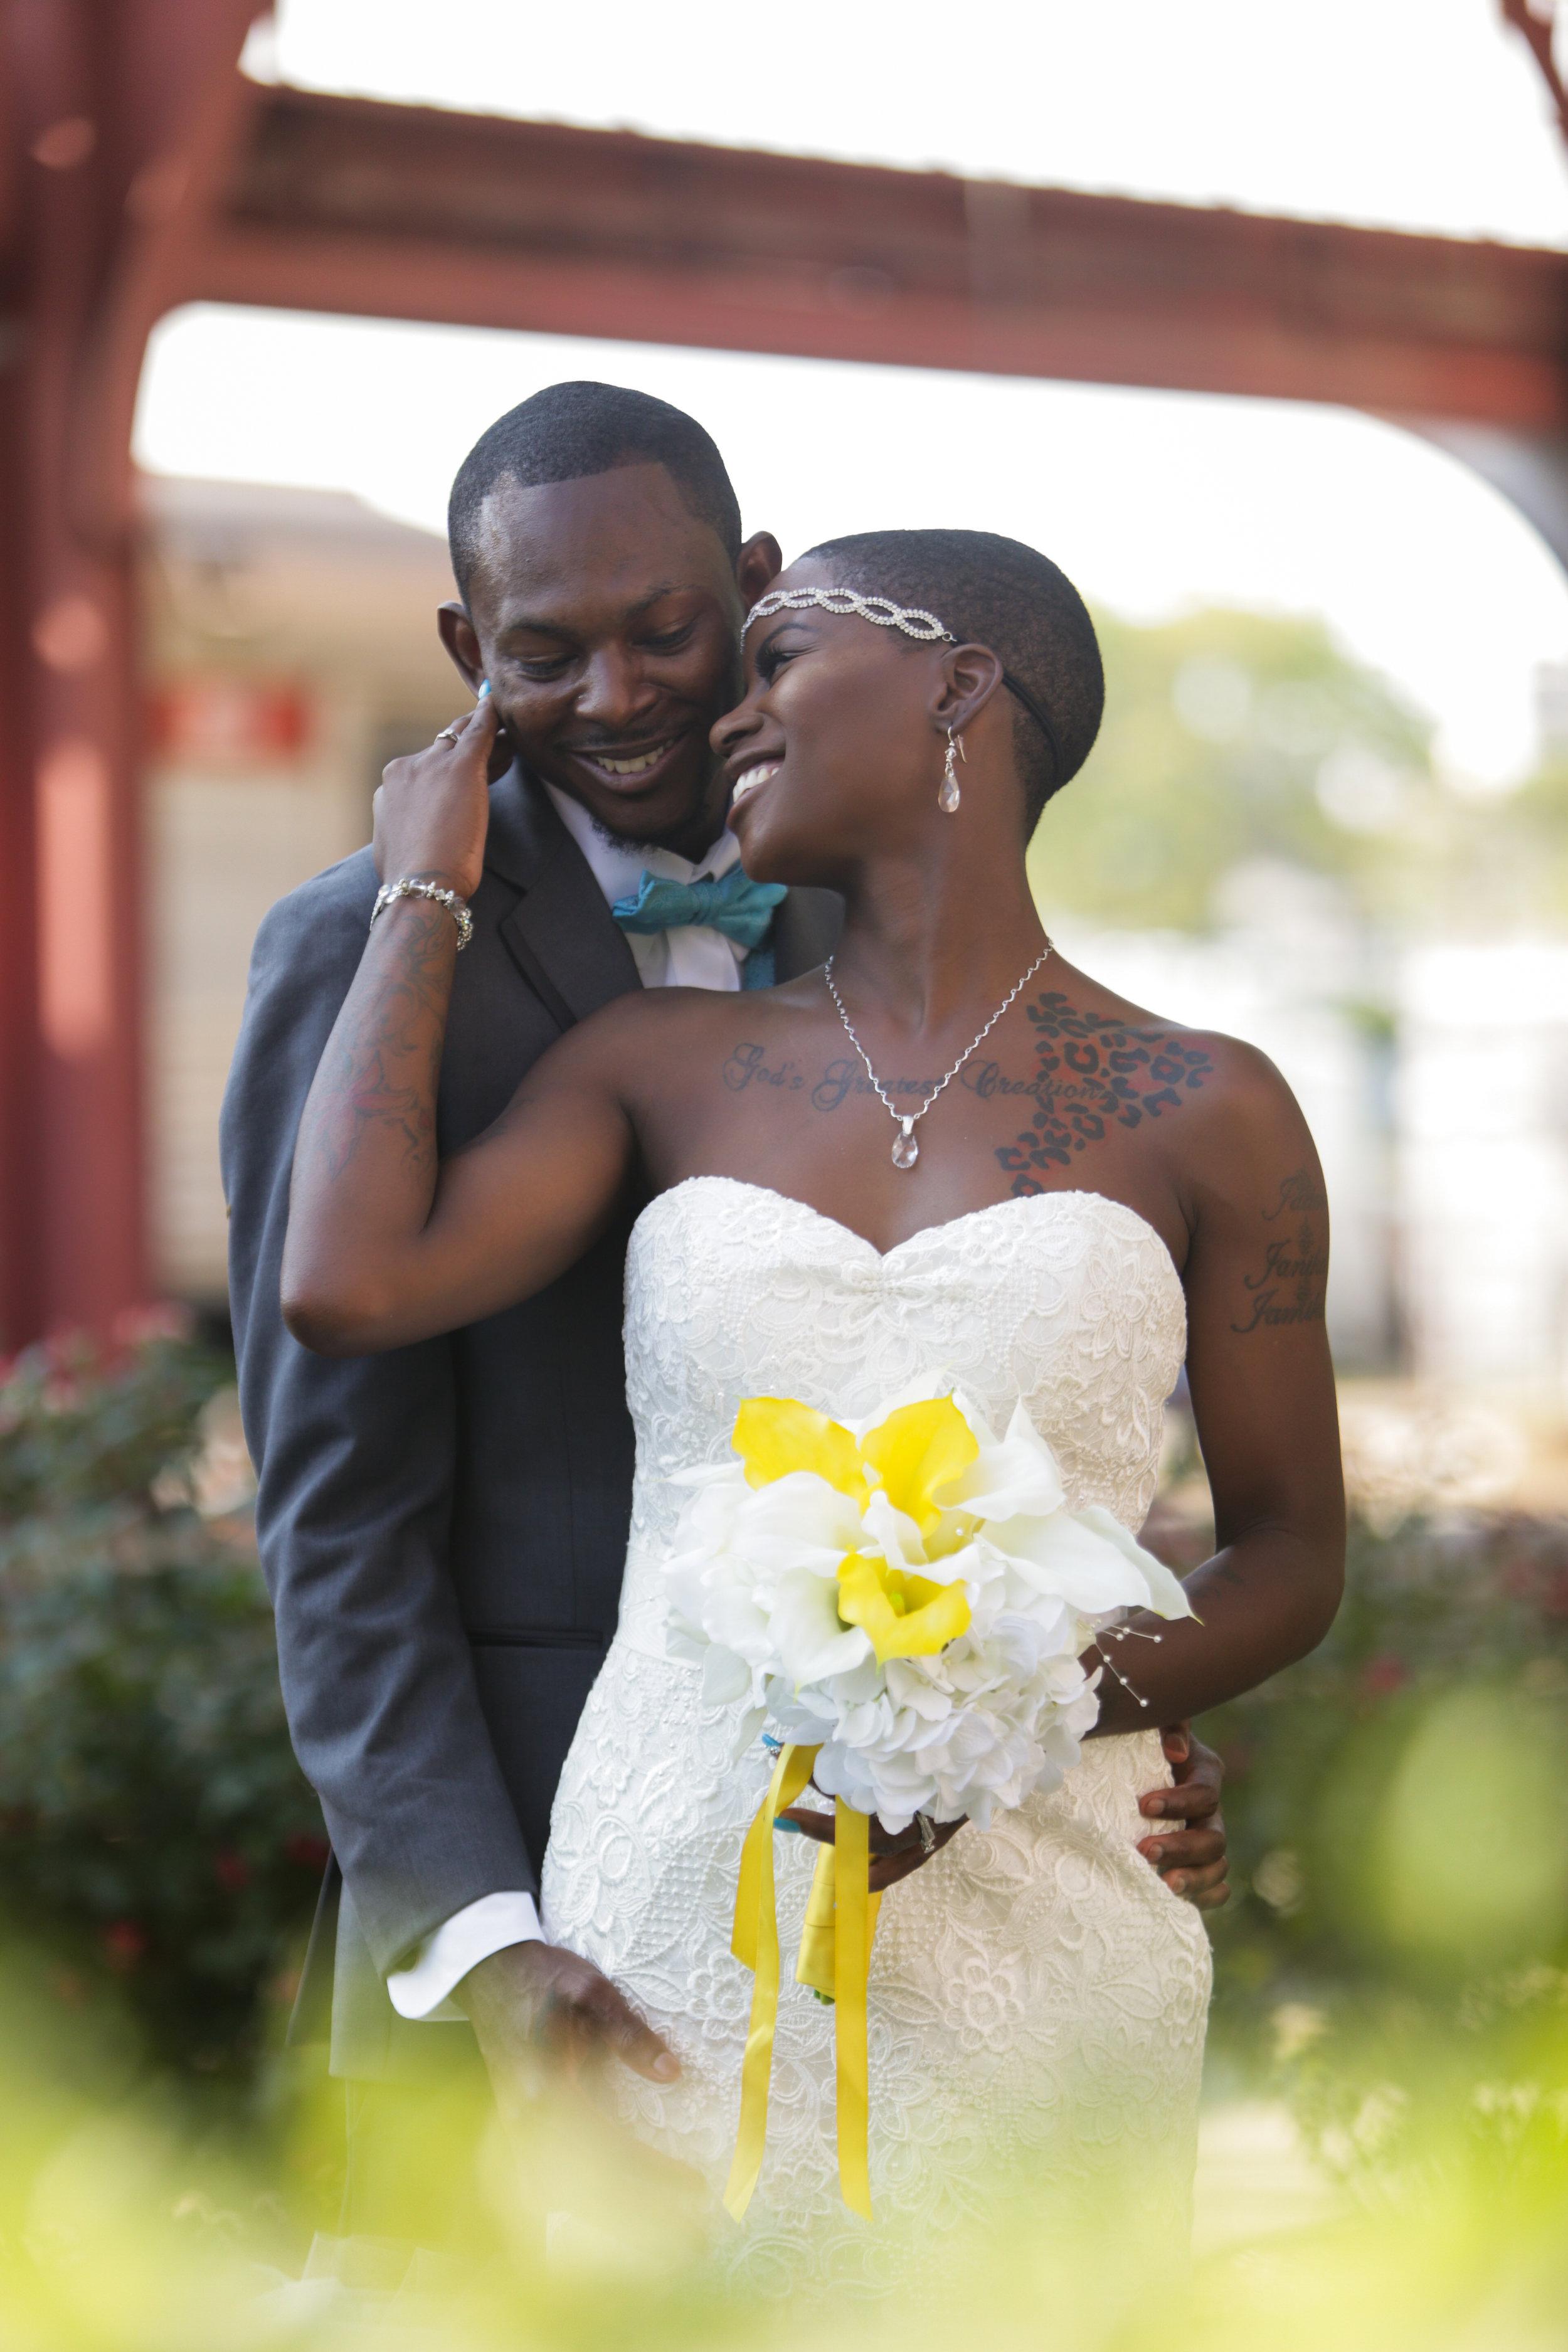 St. Louis Photographer St. Charles Photographer Engagement Wedding Photographer (33).jpg